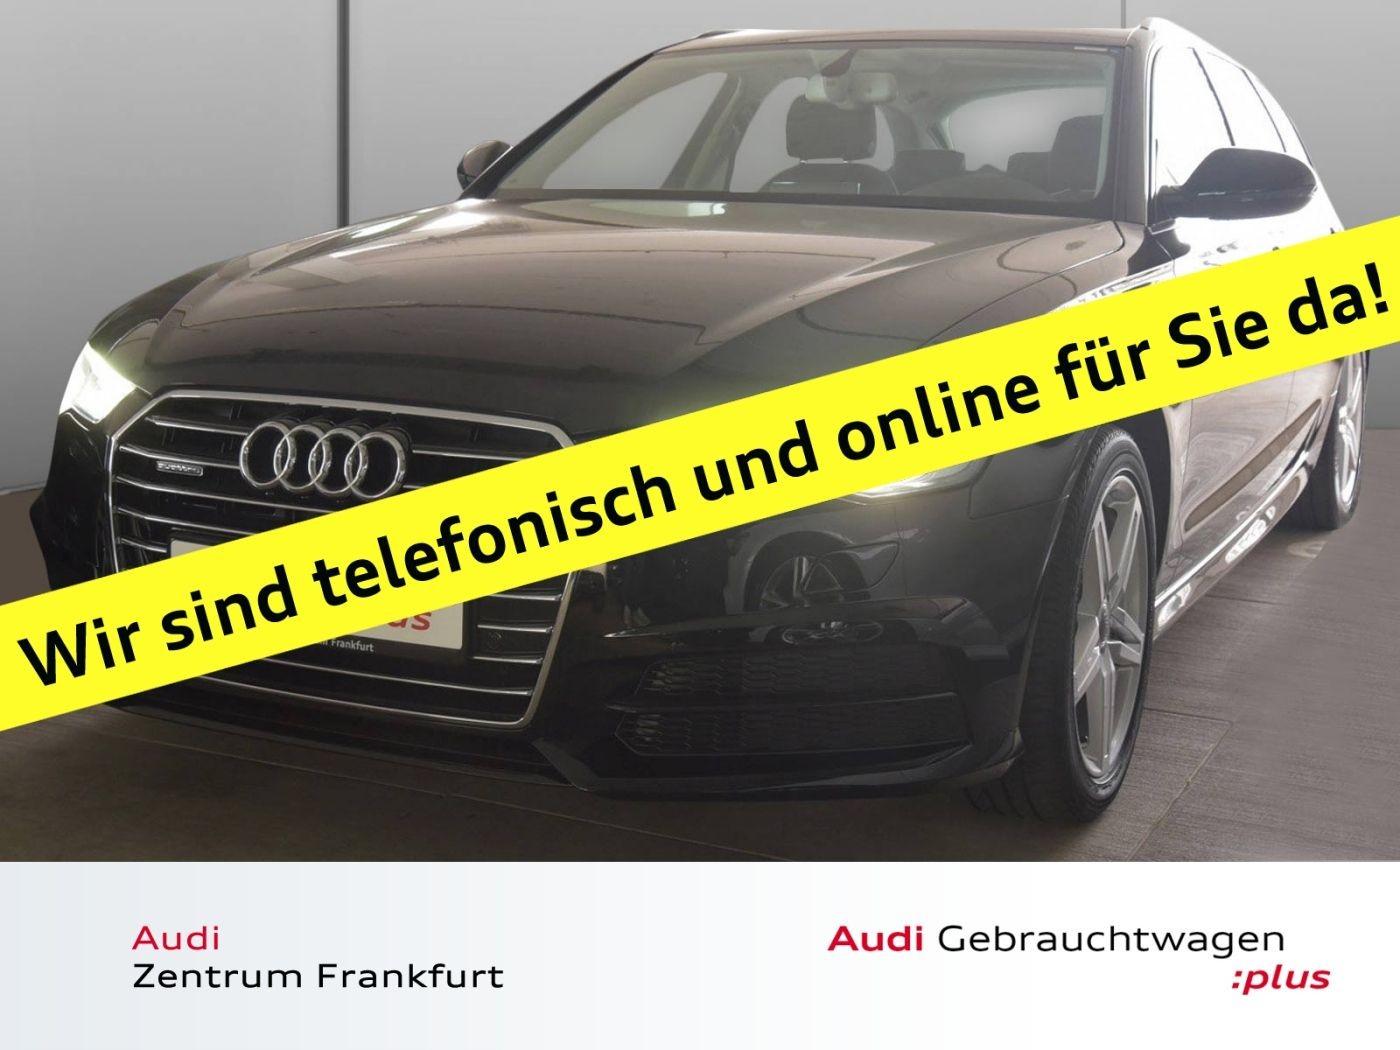 Audi A6 Avant 2.0 TDI quattro S tronic Navi Xenon Panorama Tempomat, Jahr 2018, Diesel